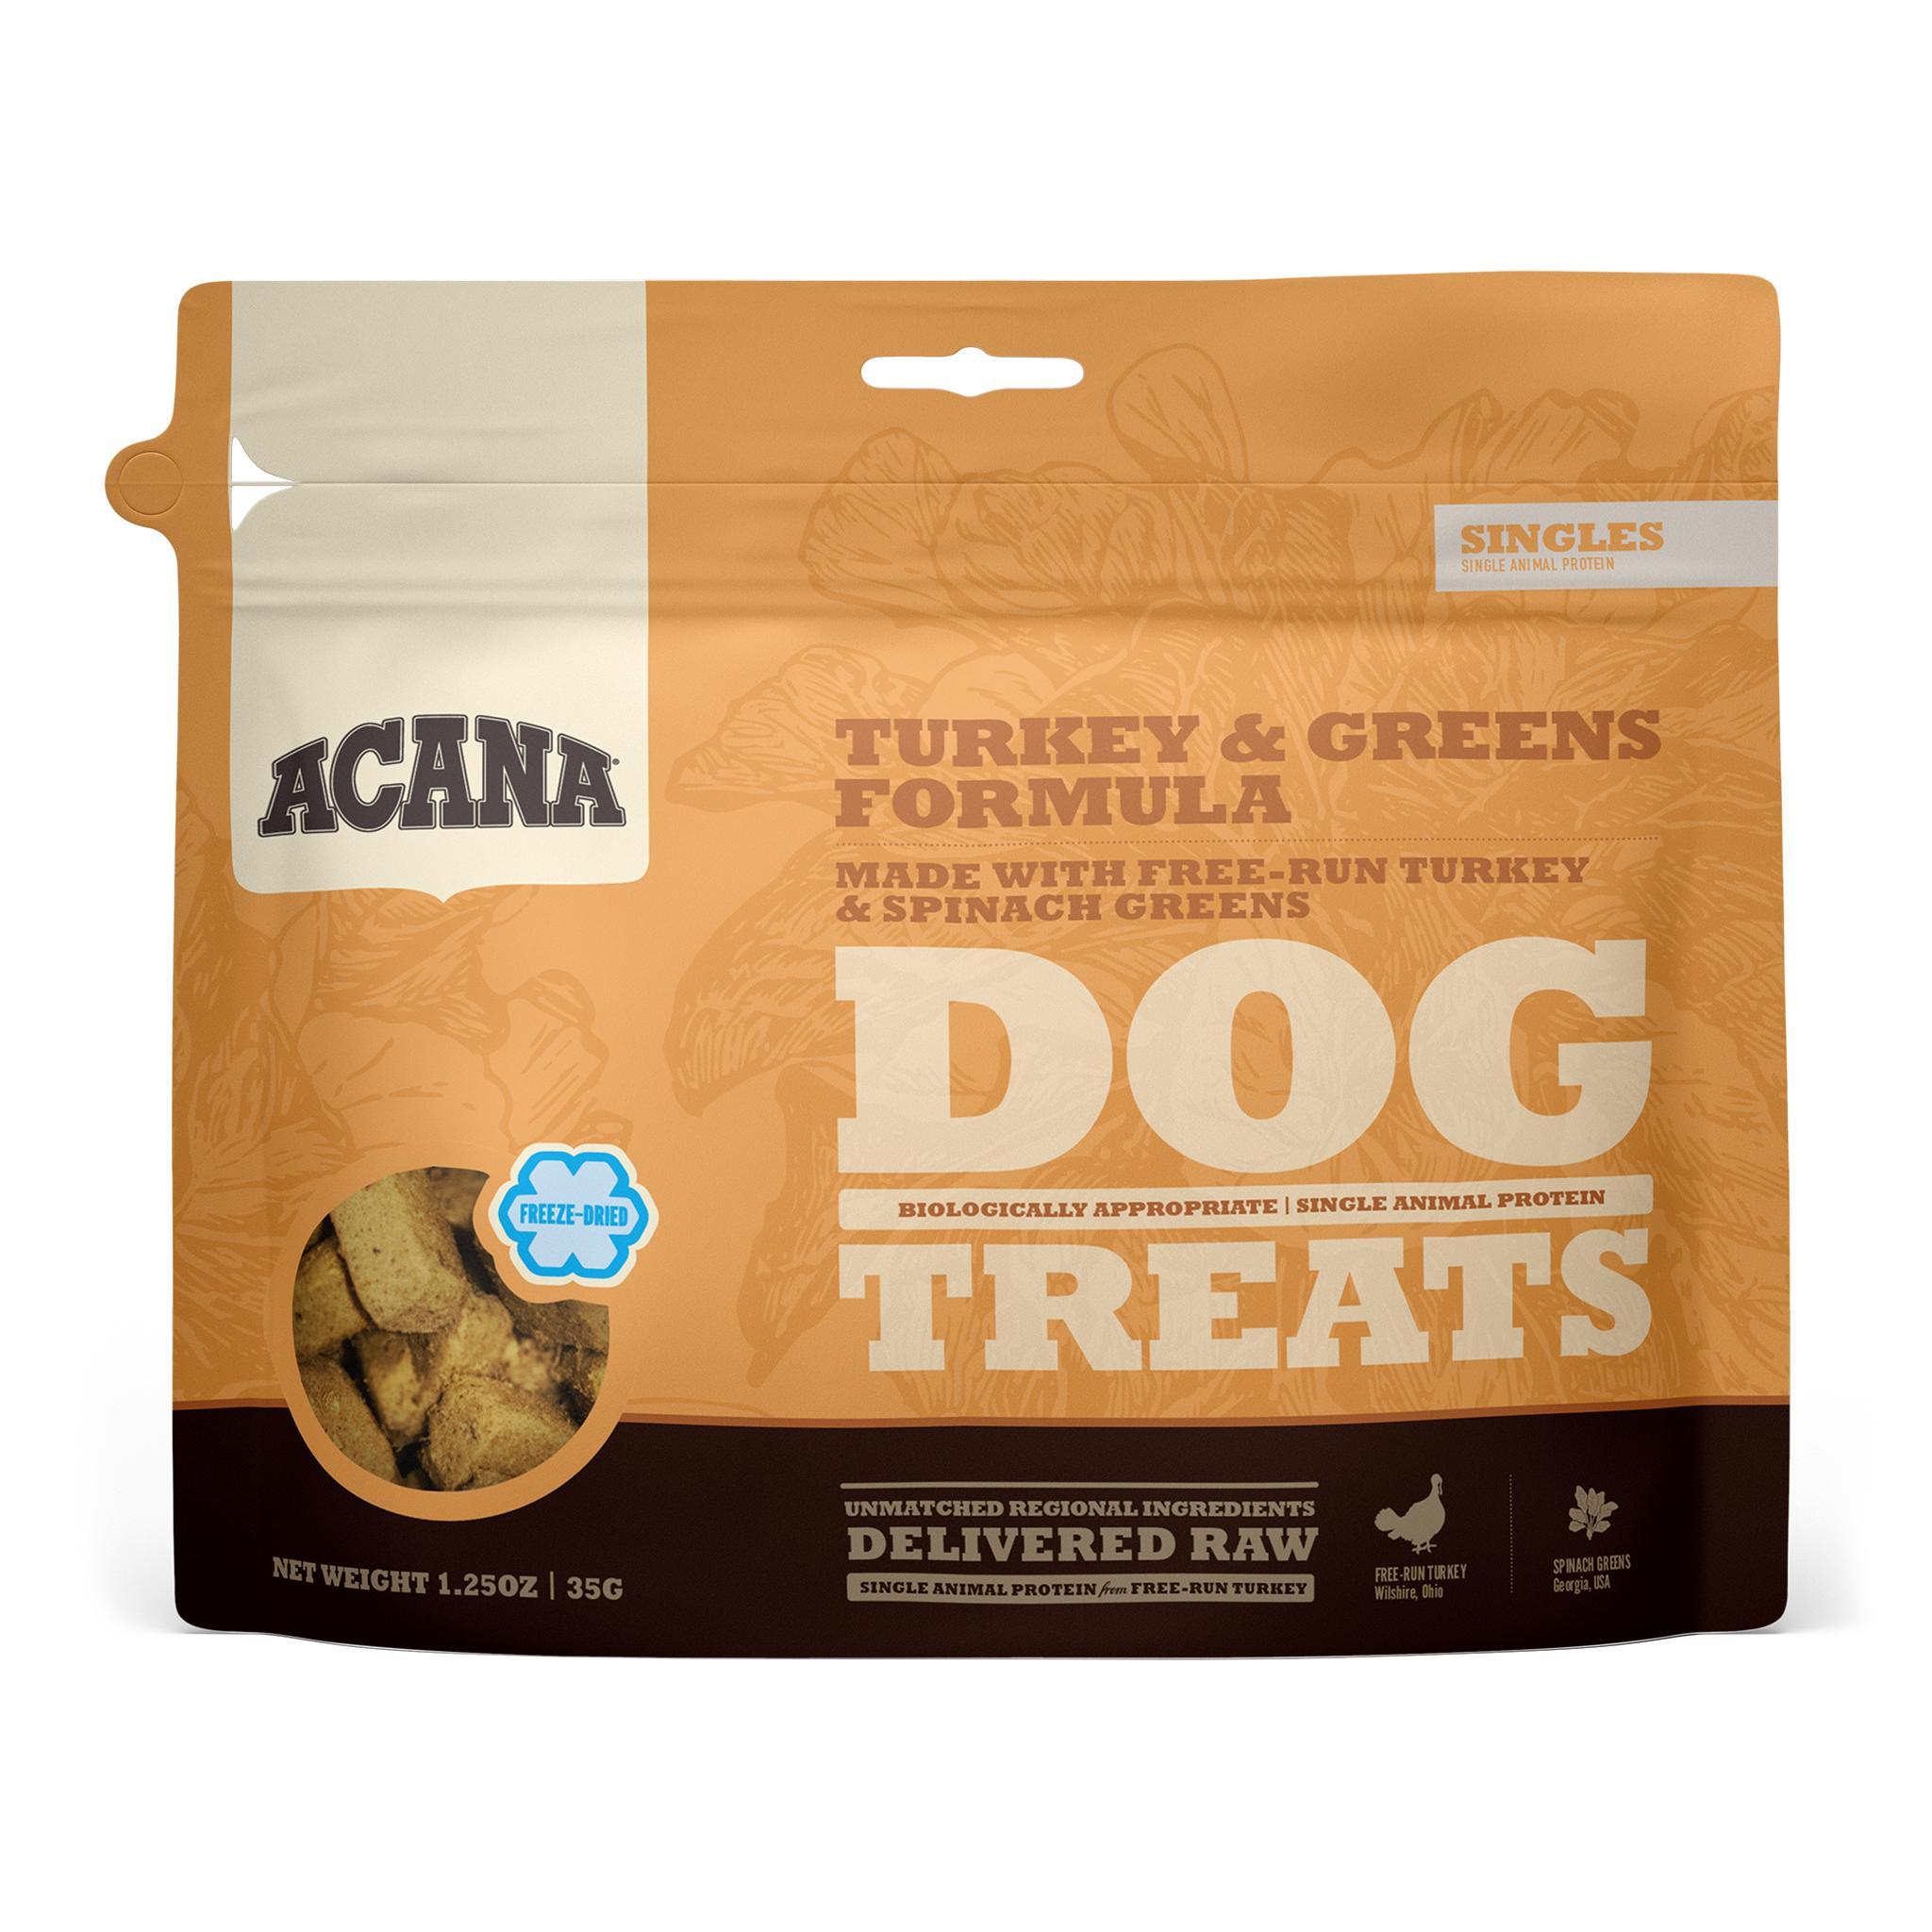 ACANA Singles Turkey & Greens Grain-Free Freeze-Dried Dog Treats, 1.25-oz